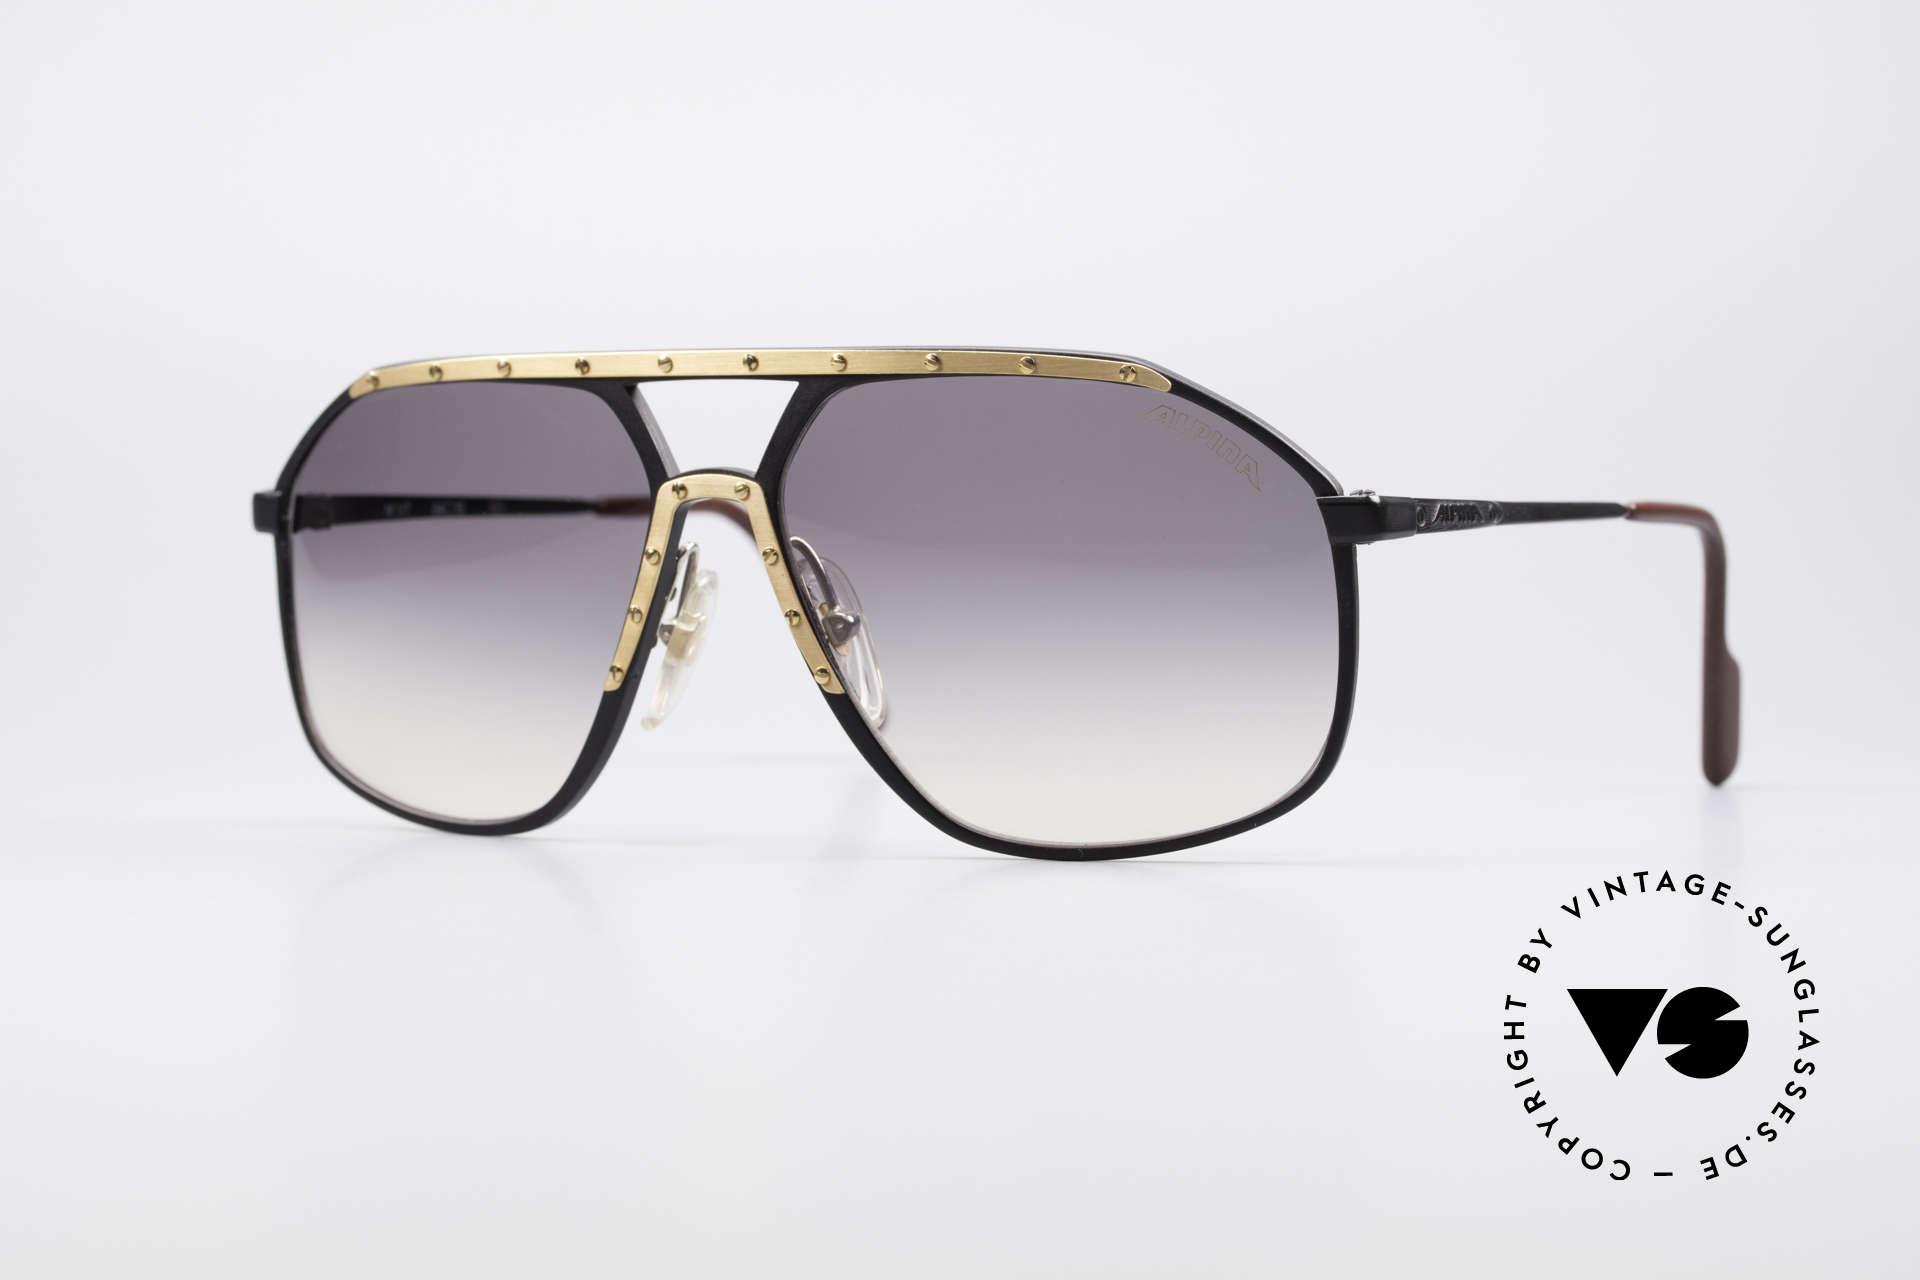 Alpina M1/7 Iconic Vintage Sunglasses, legendary ALPINA M1/7 vintage designer sunglasses, Made for Men